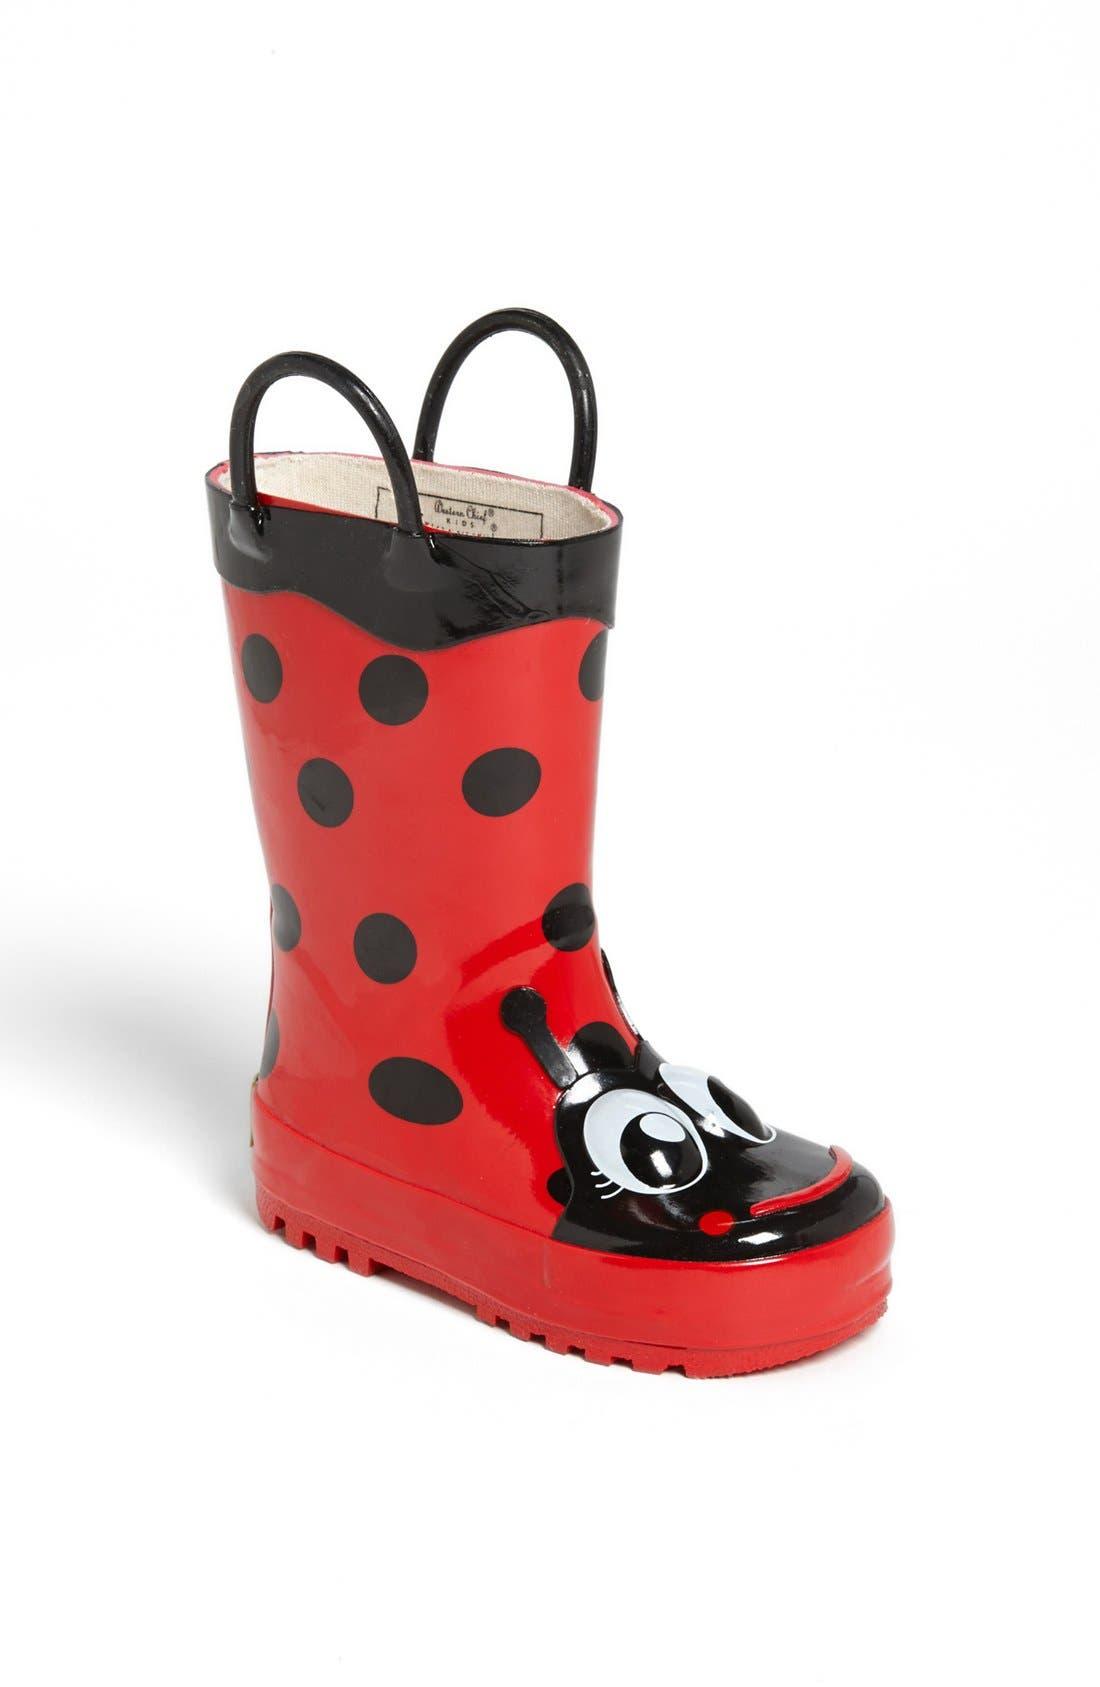 Ladybug Waterproof Rain Boot,                         Main,                         color, RED